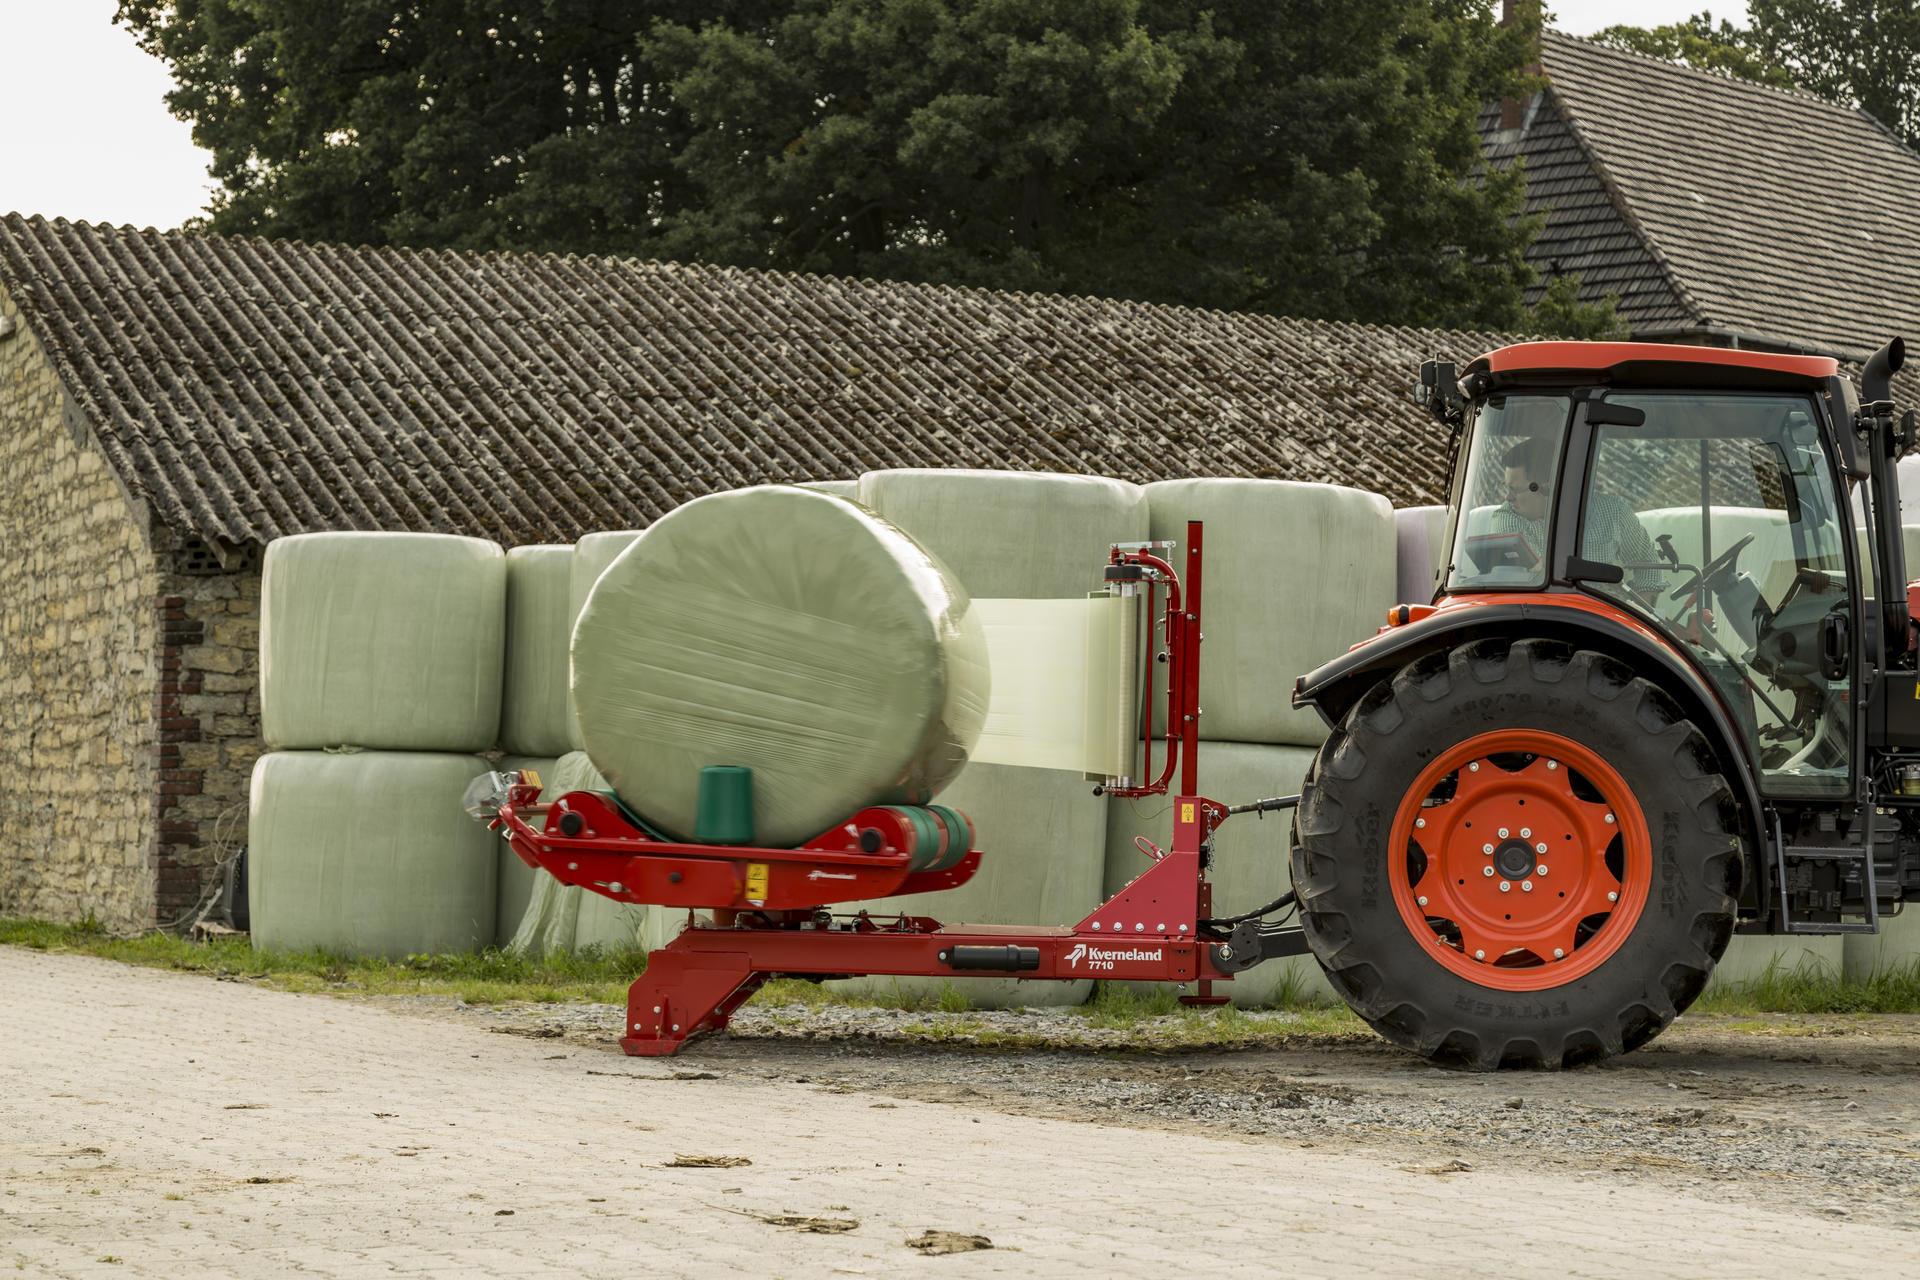 kverneland 7710 round bale wrappers bale equipment kverneland rh ien kverneland com